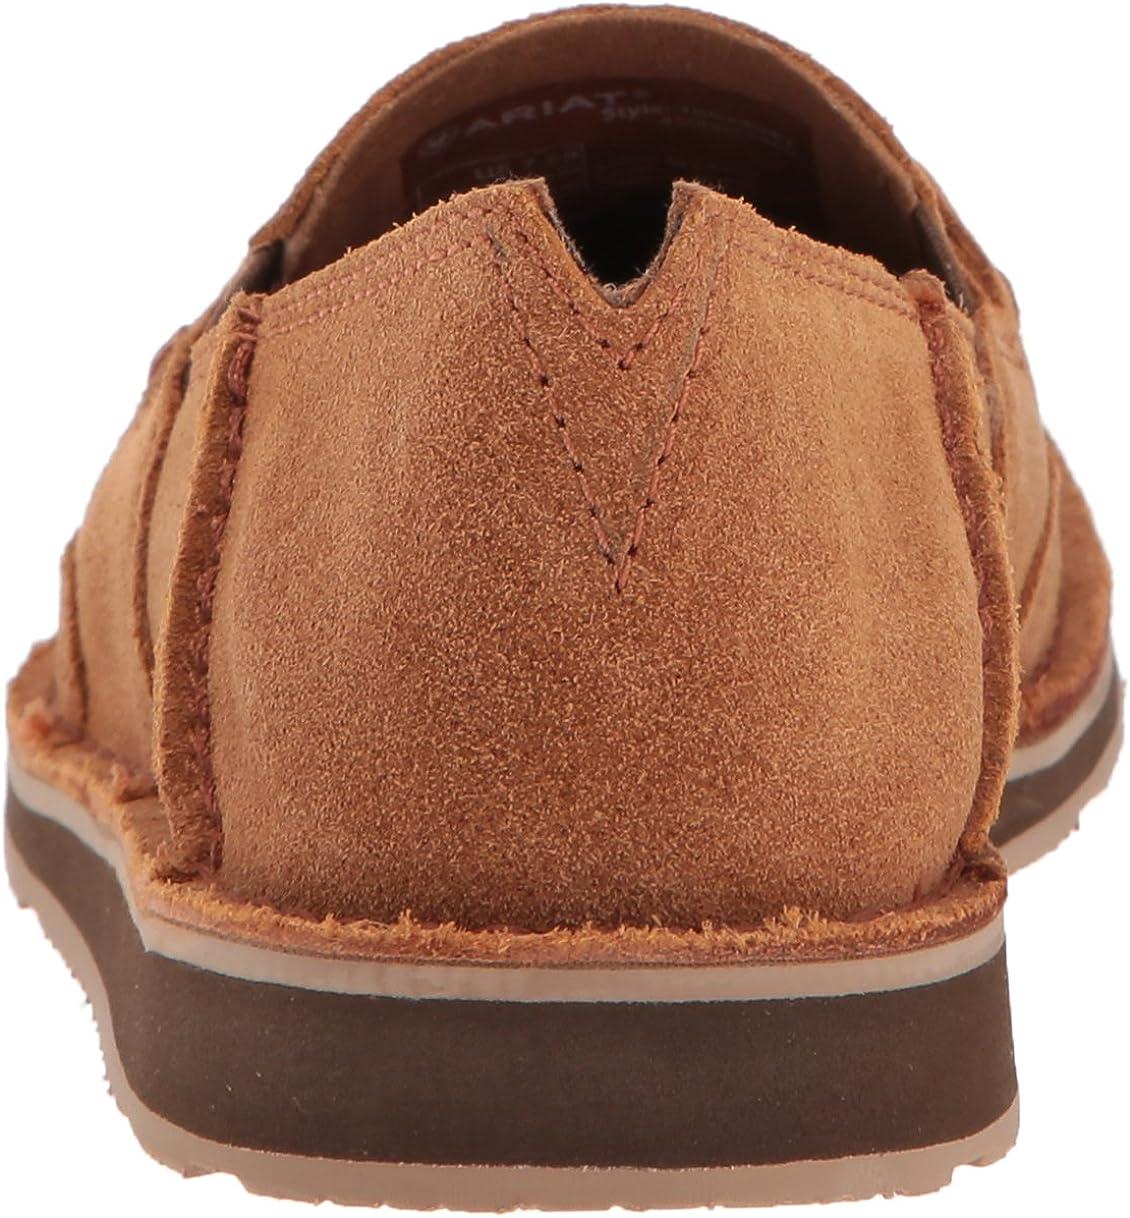 Ariat Bit Cruiser Womens Shoes Noisette